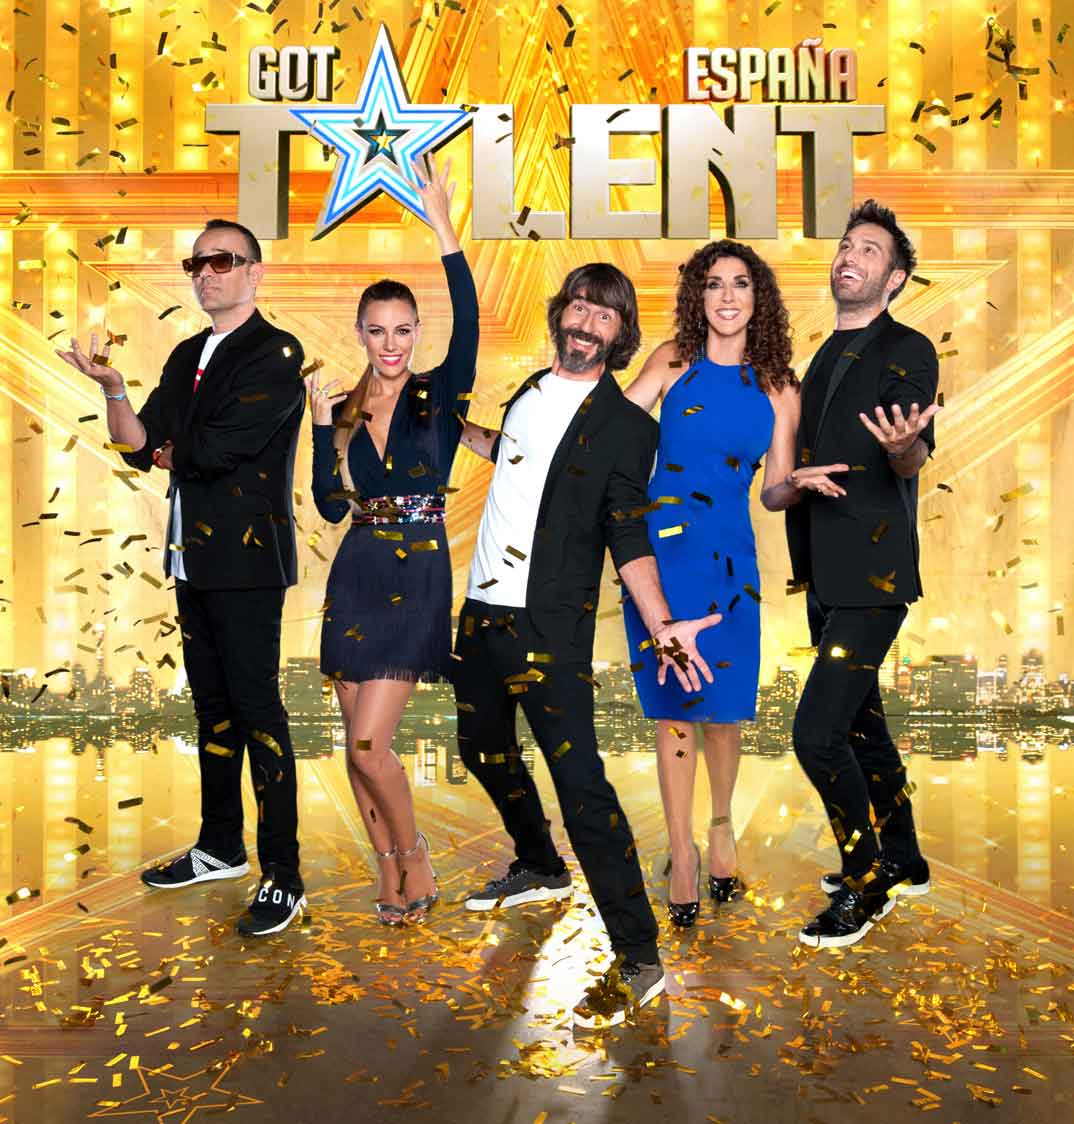 Risto Mejide, Edurne, Santi Millán, Paz Padilla y Dani Martínez - Got Talent España 5 © Mediaset